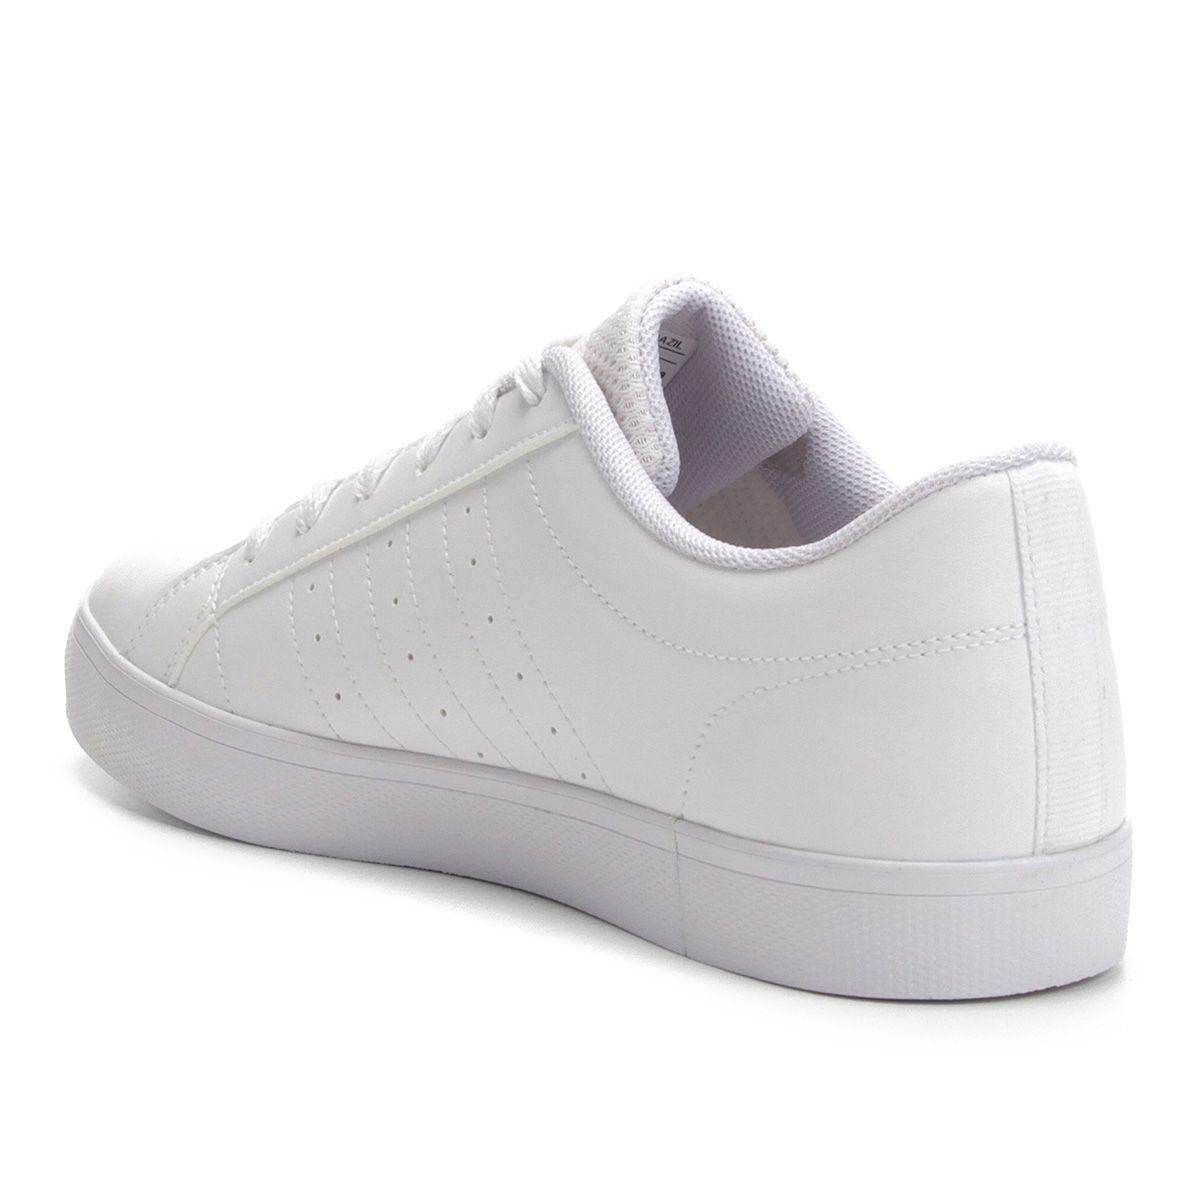 ec68c34a4 Tênis Adidas VS Pace Masculino - Branco e Preto - Compre Agora